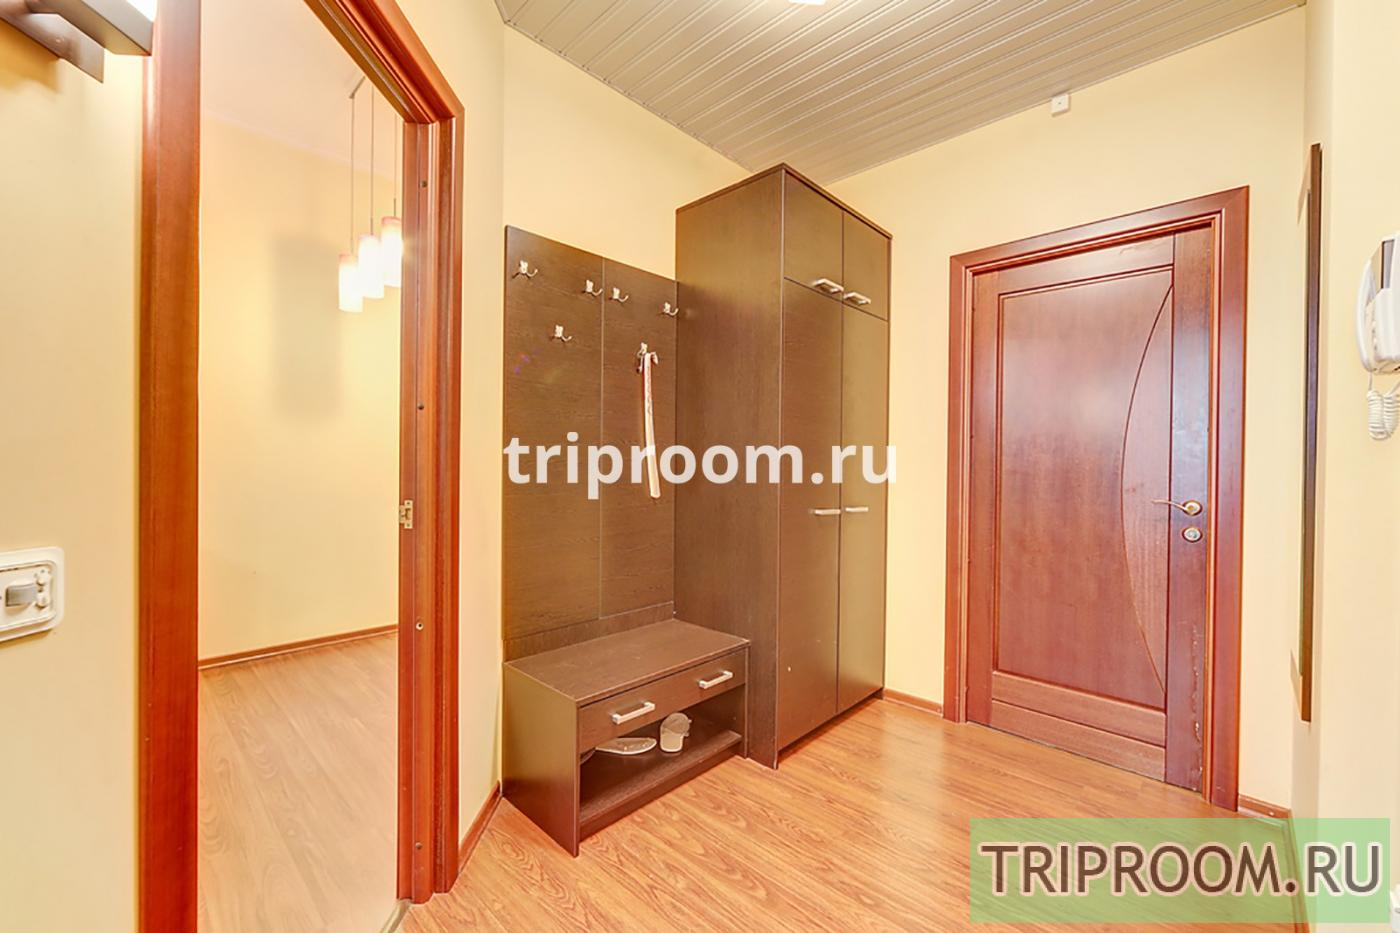 1-комнатная квартира посуточно (вариант № 15527), ул. Канала Грибоедова набережная, фото № 18